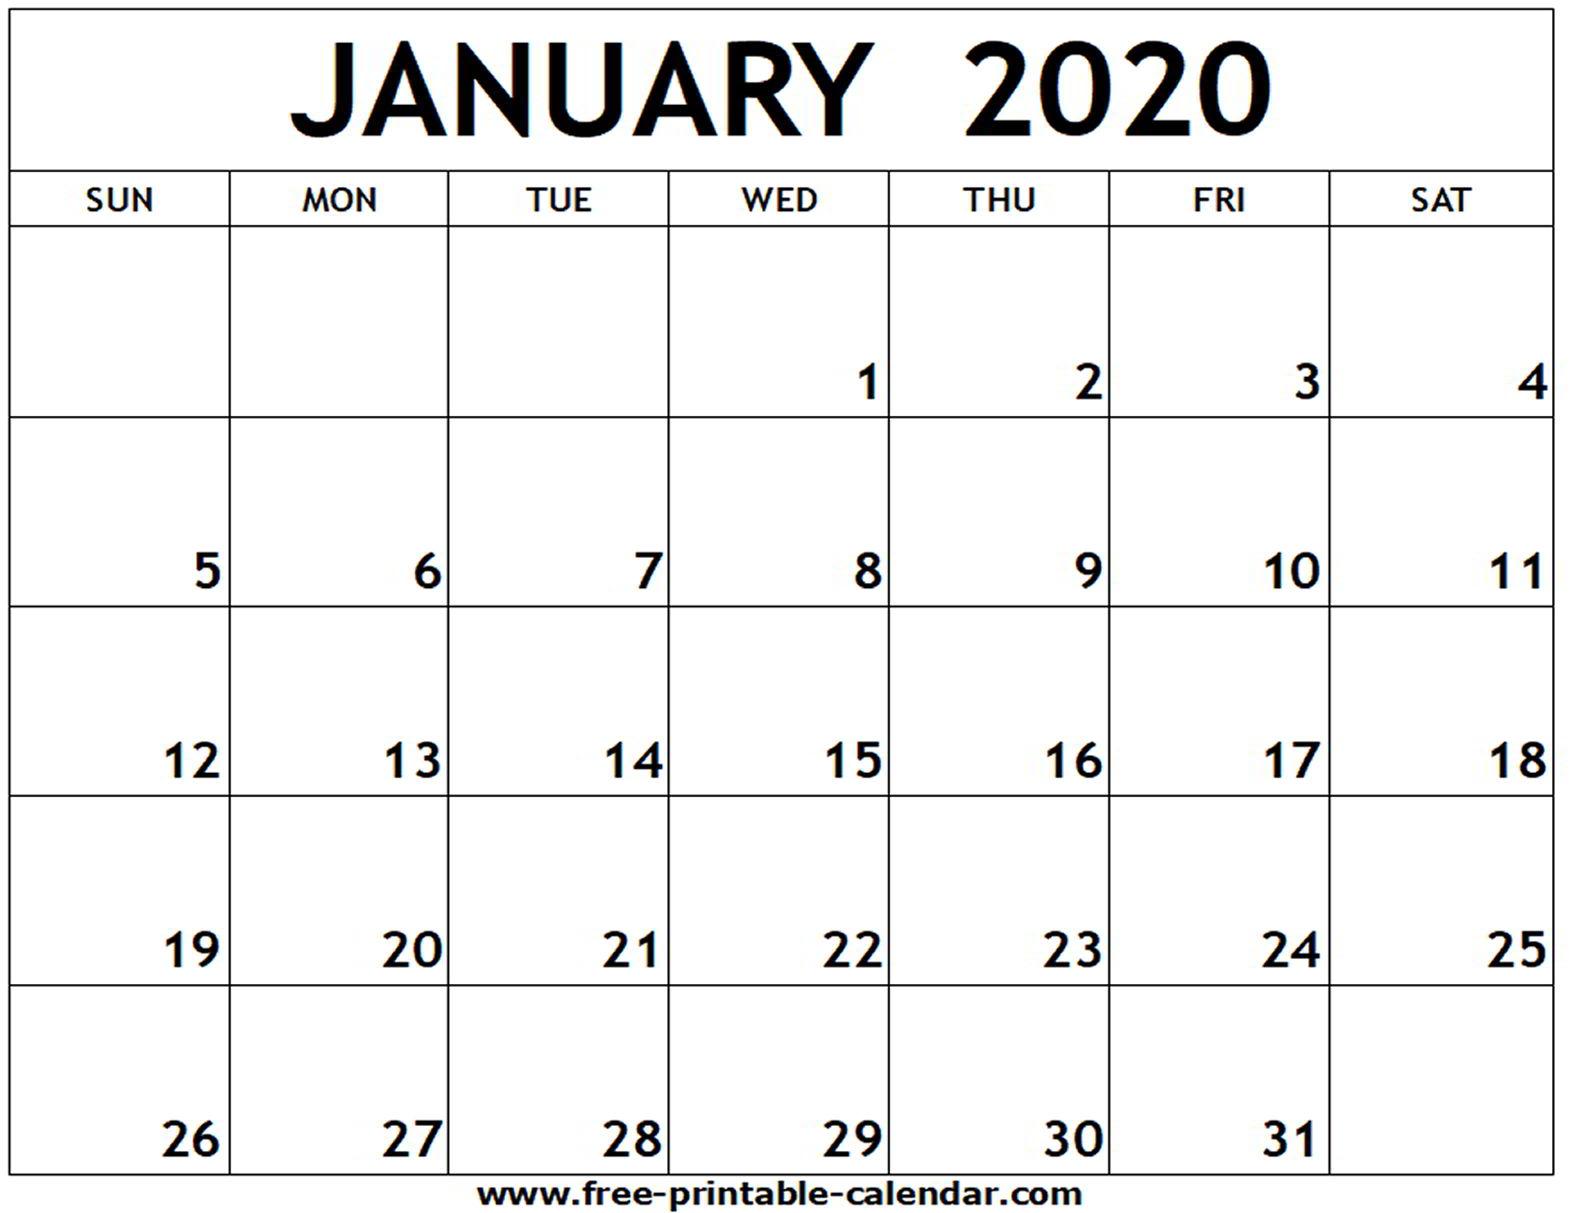 Free 2020 January Calendar - Togo.wpart.co